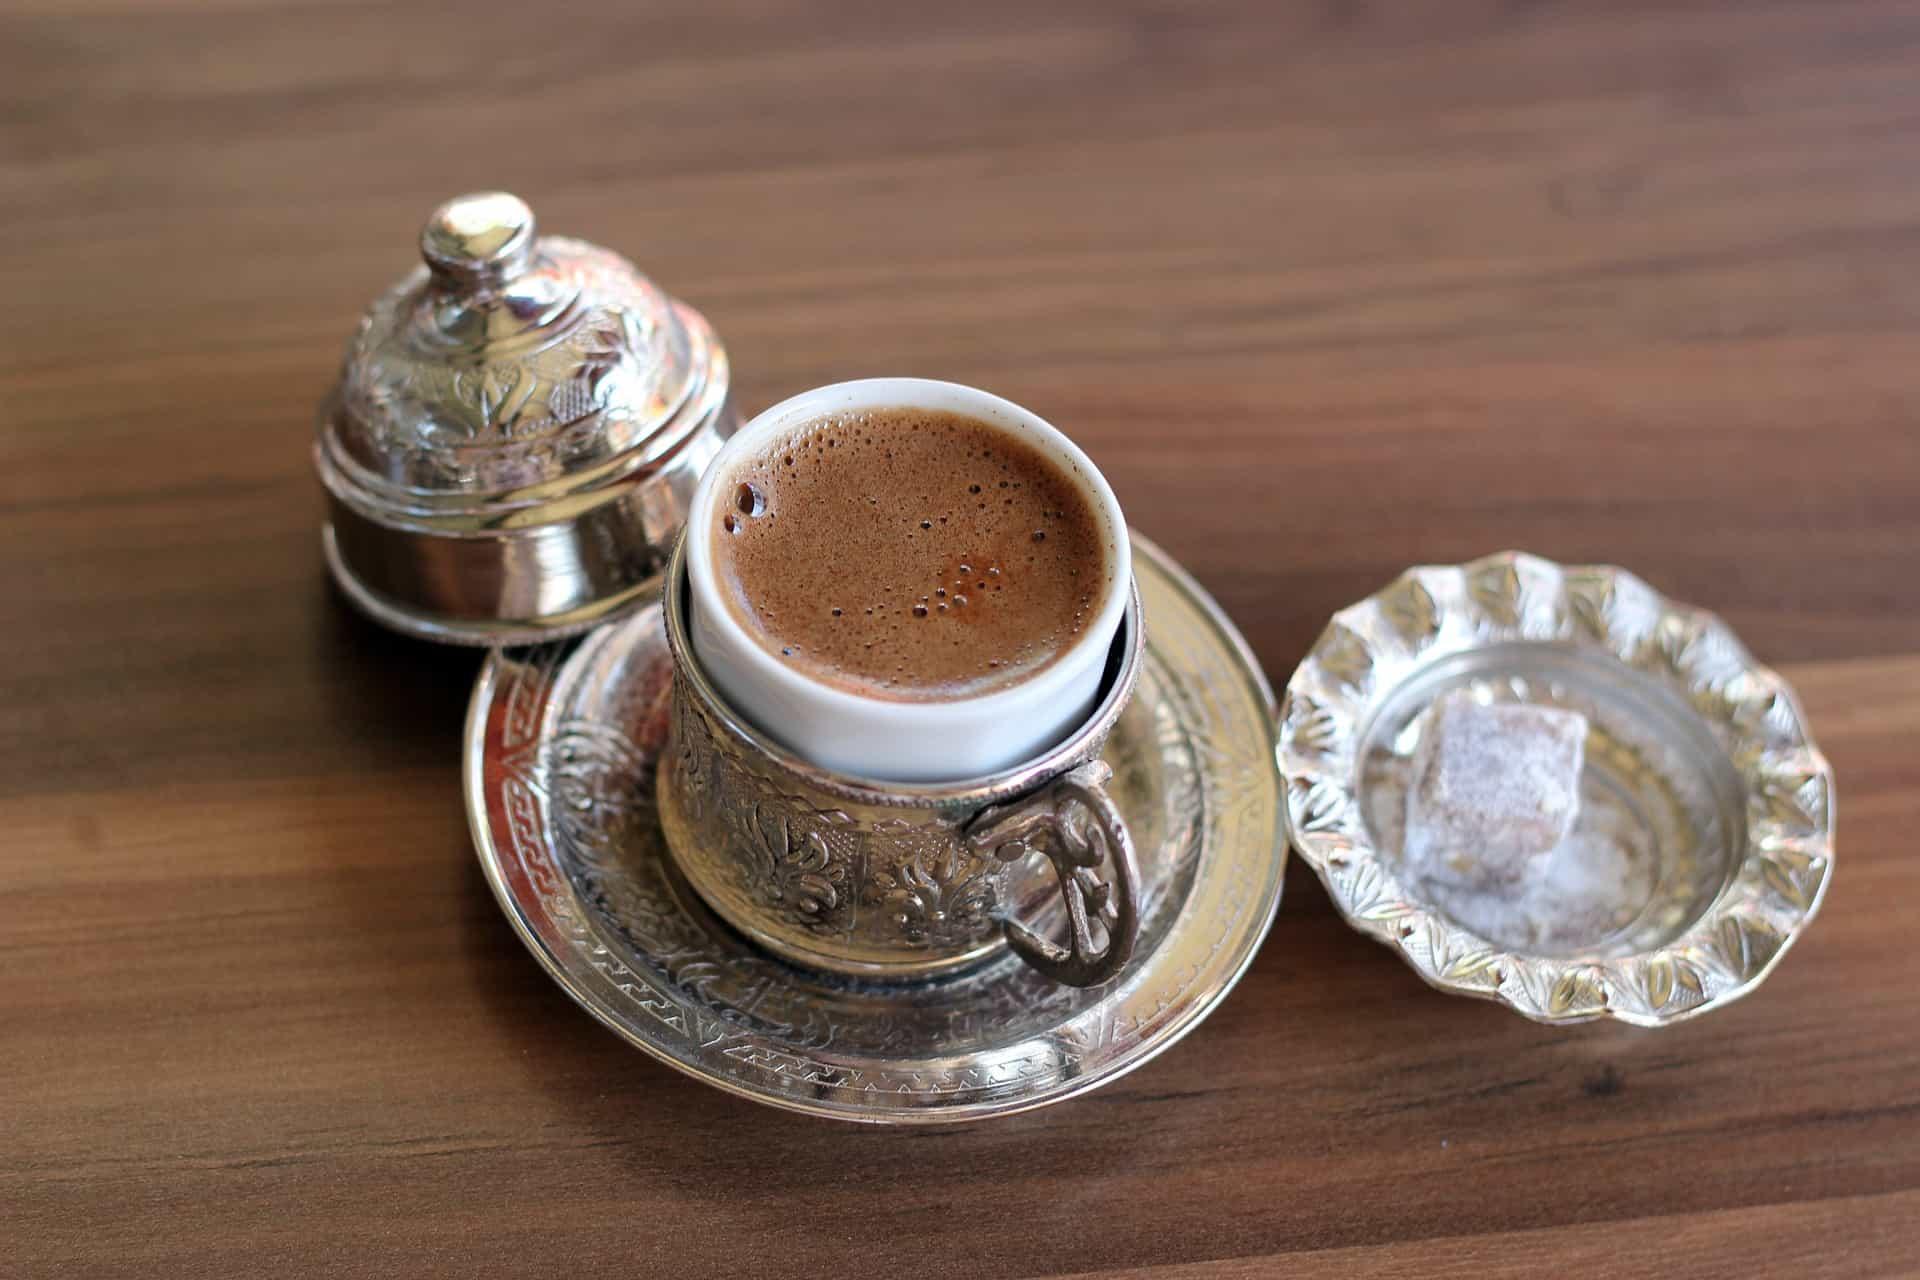 turkish-coffee-1021286_1920.jpg